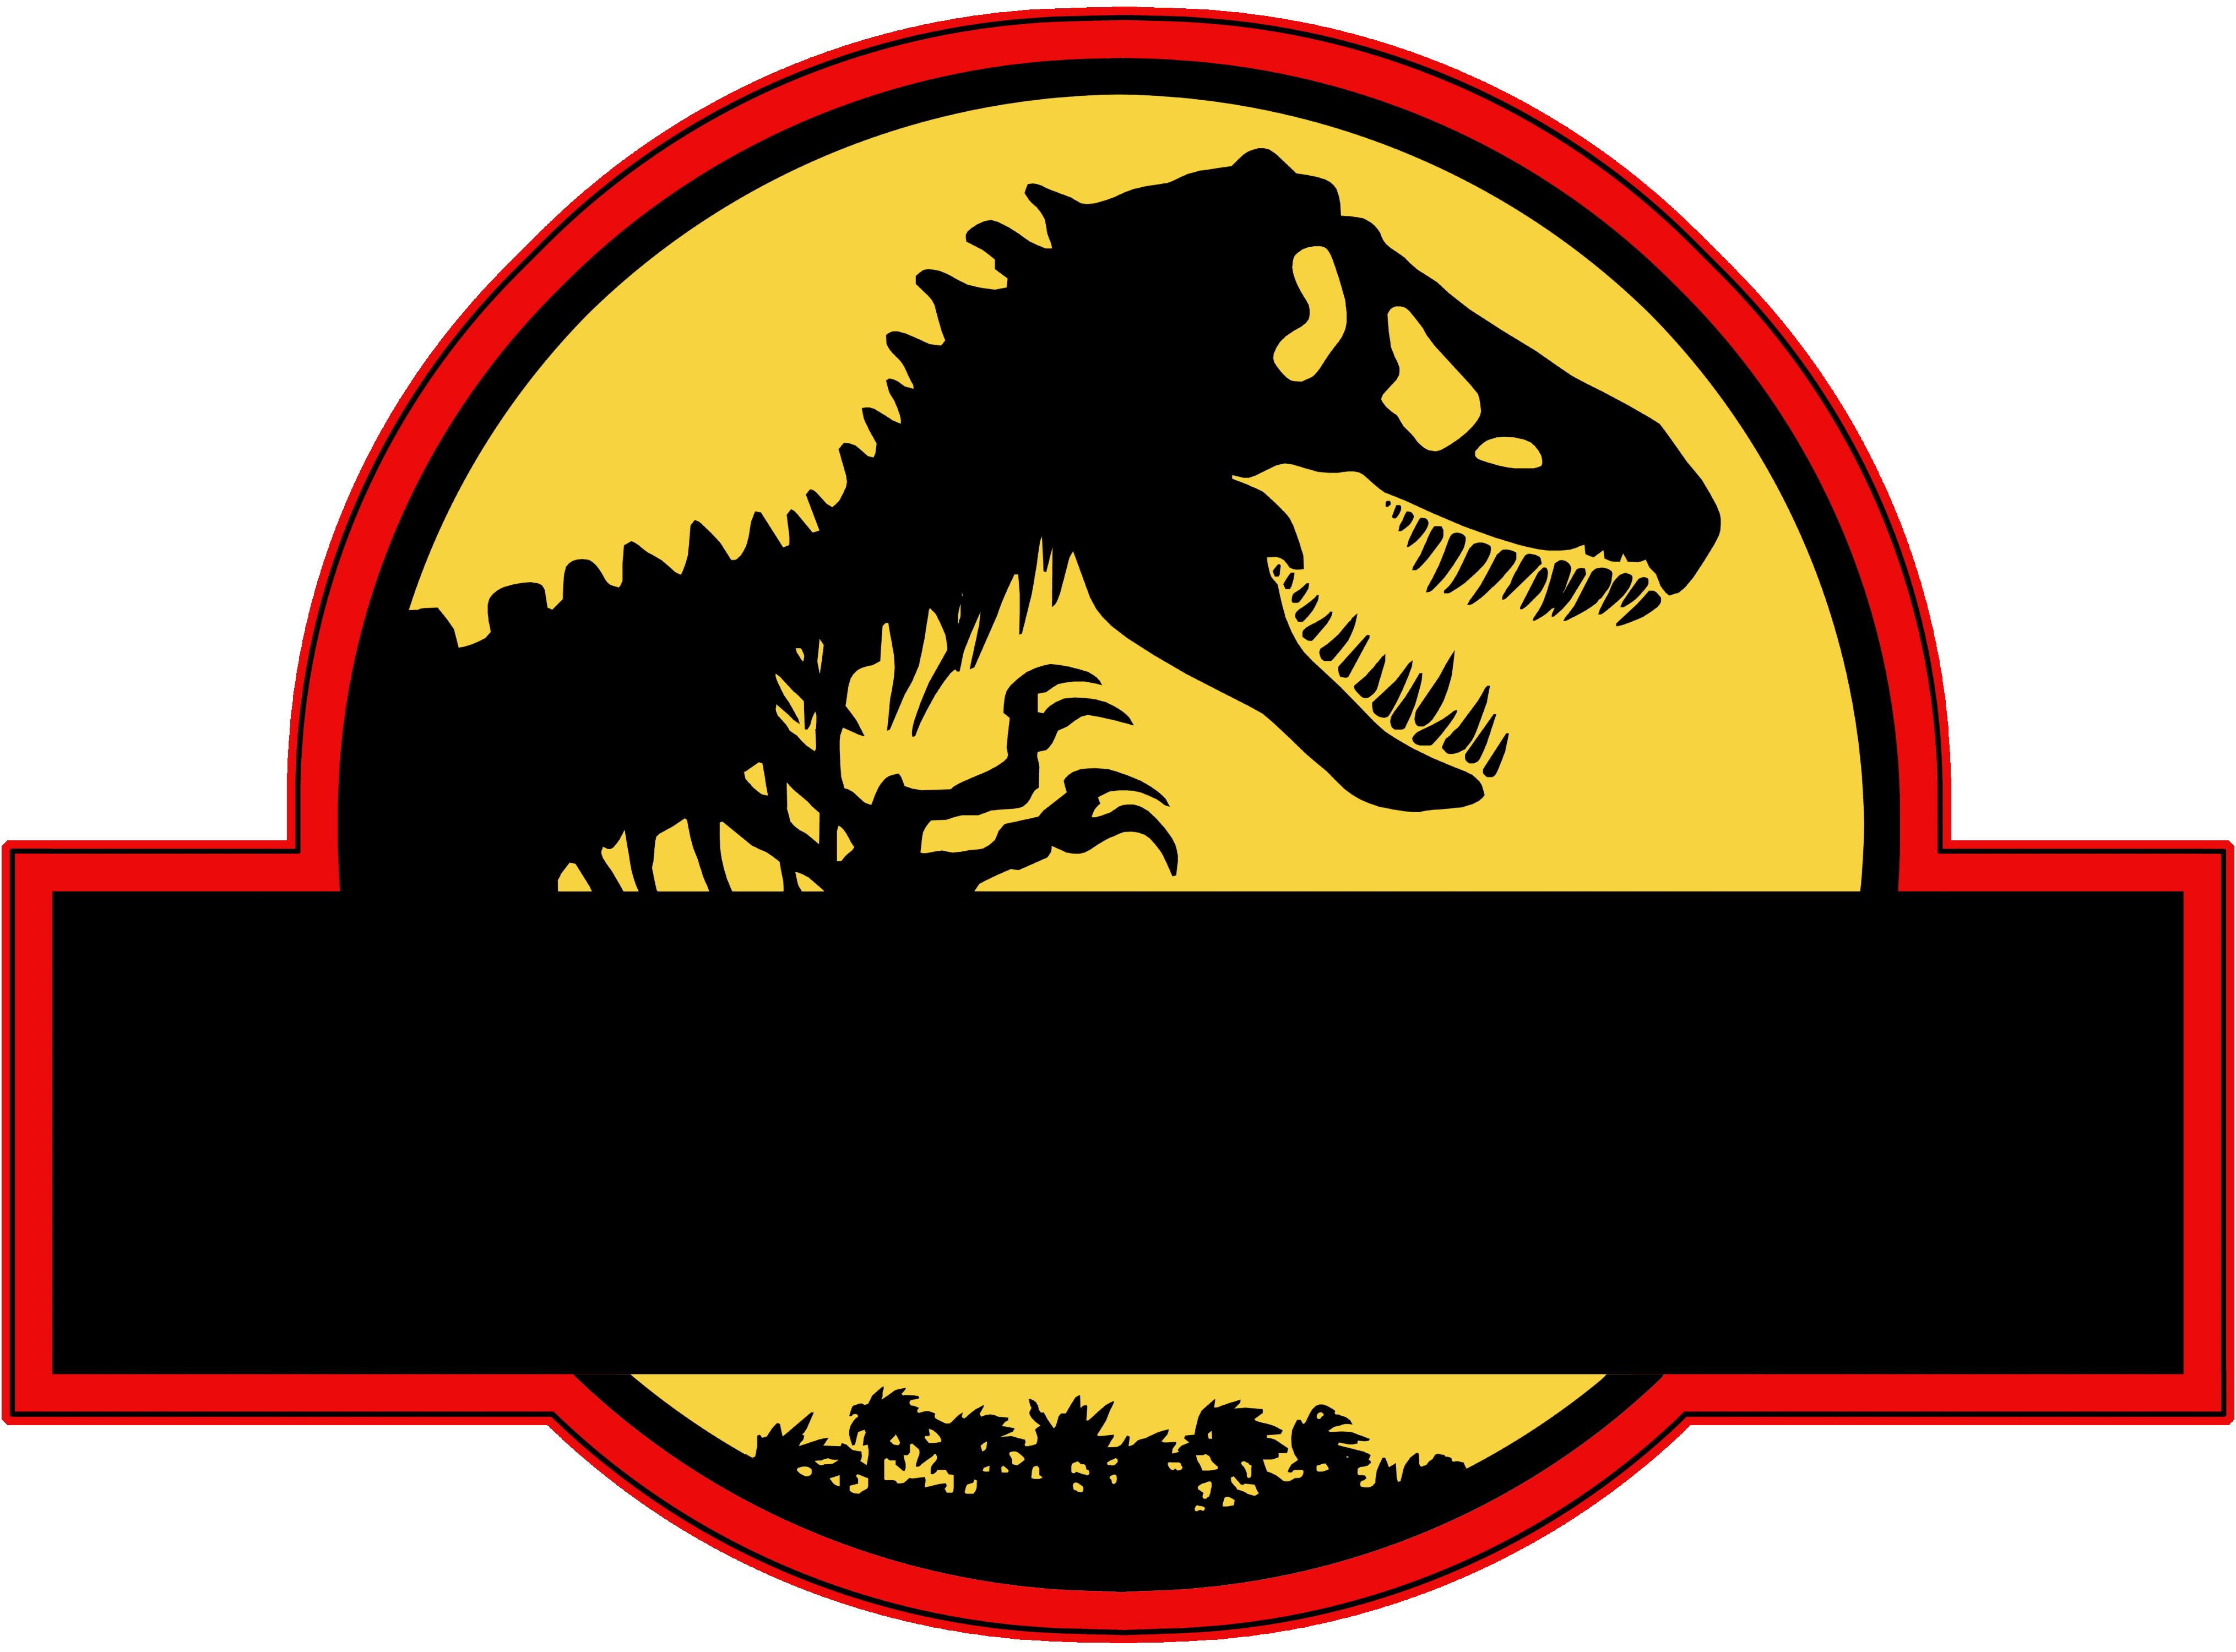 Jurassic Park 9x12 Sticker Decal Vinyl Jeep Safari Dinosaur Large 2